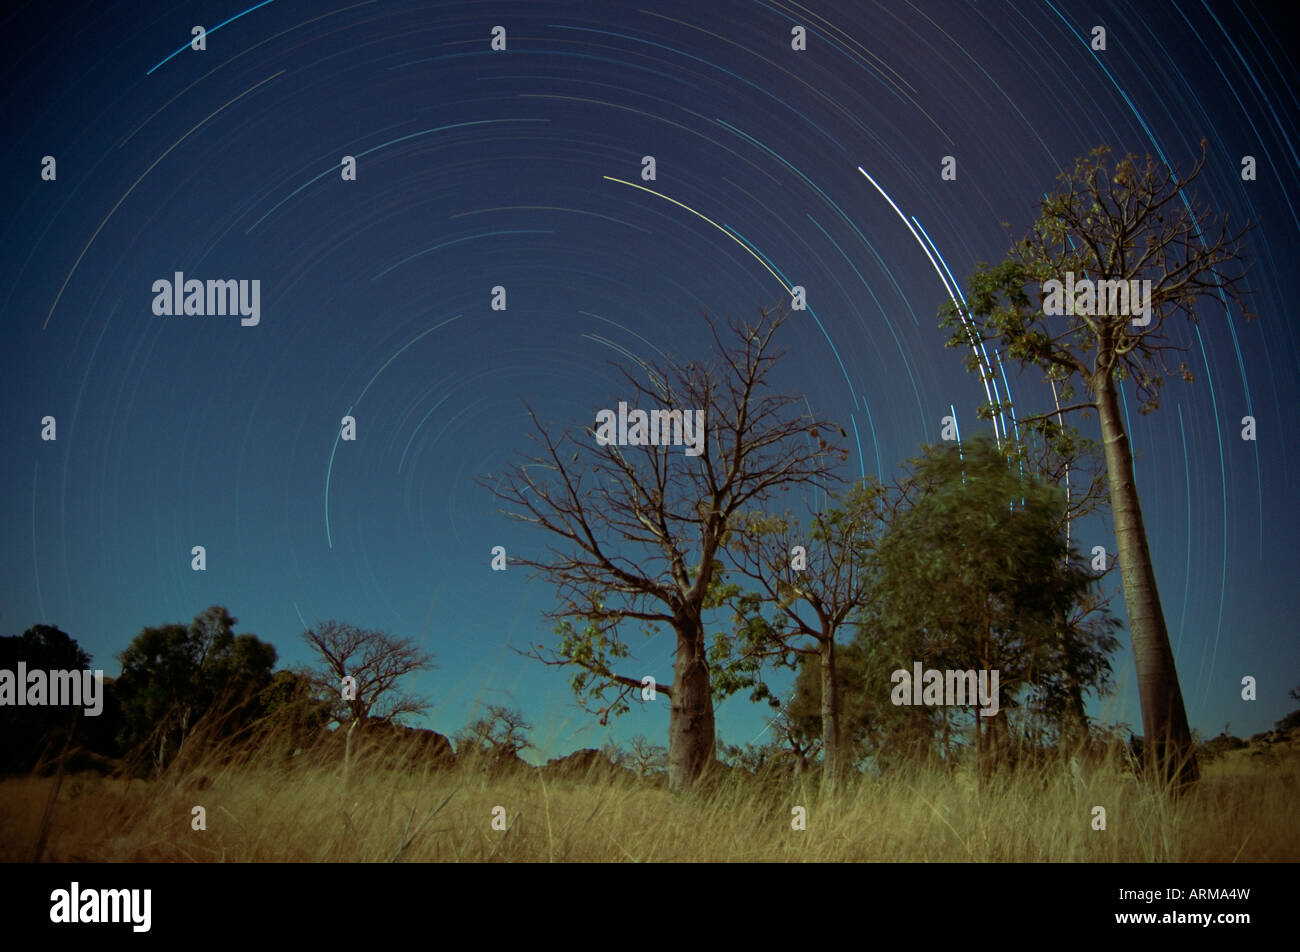 Star trails, Kimberley, Western Australia, Australia, Pacific - Stock Image